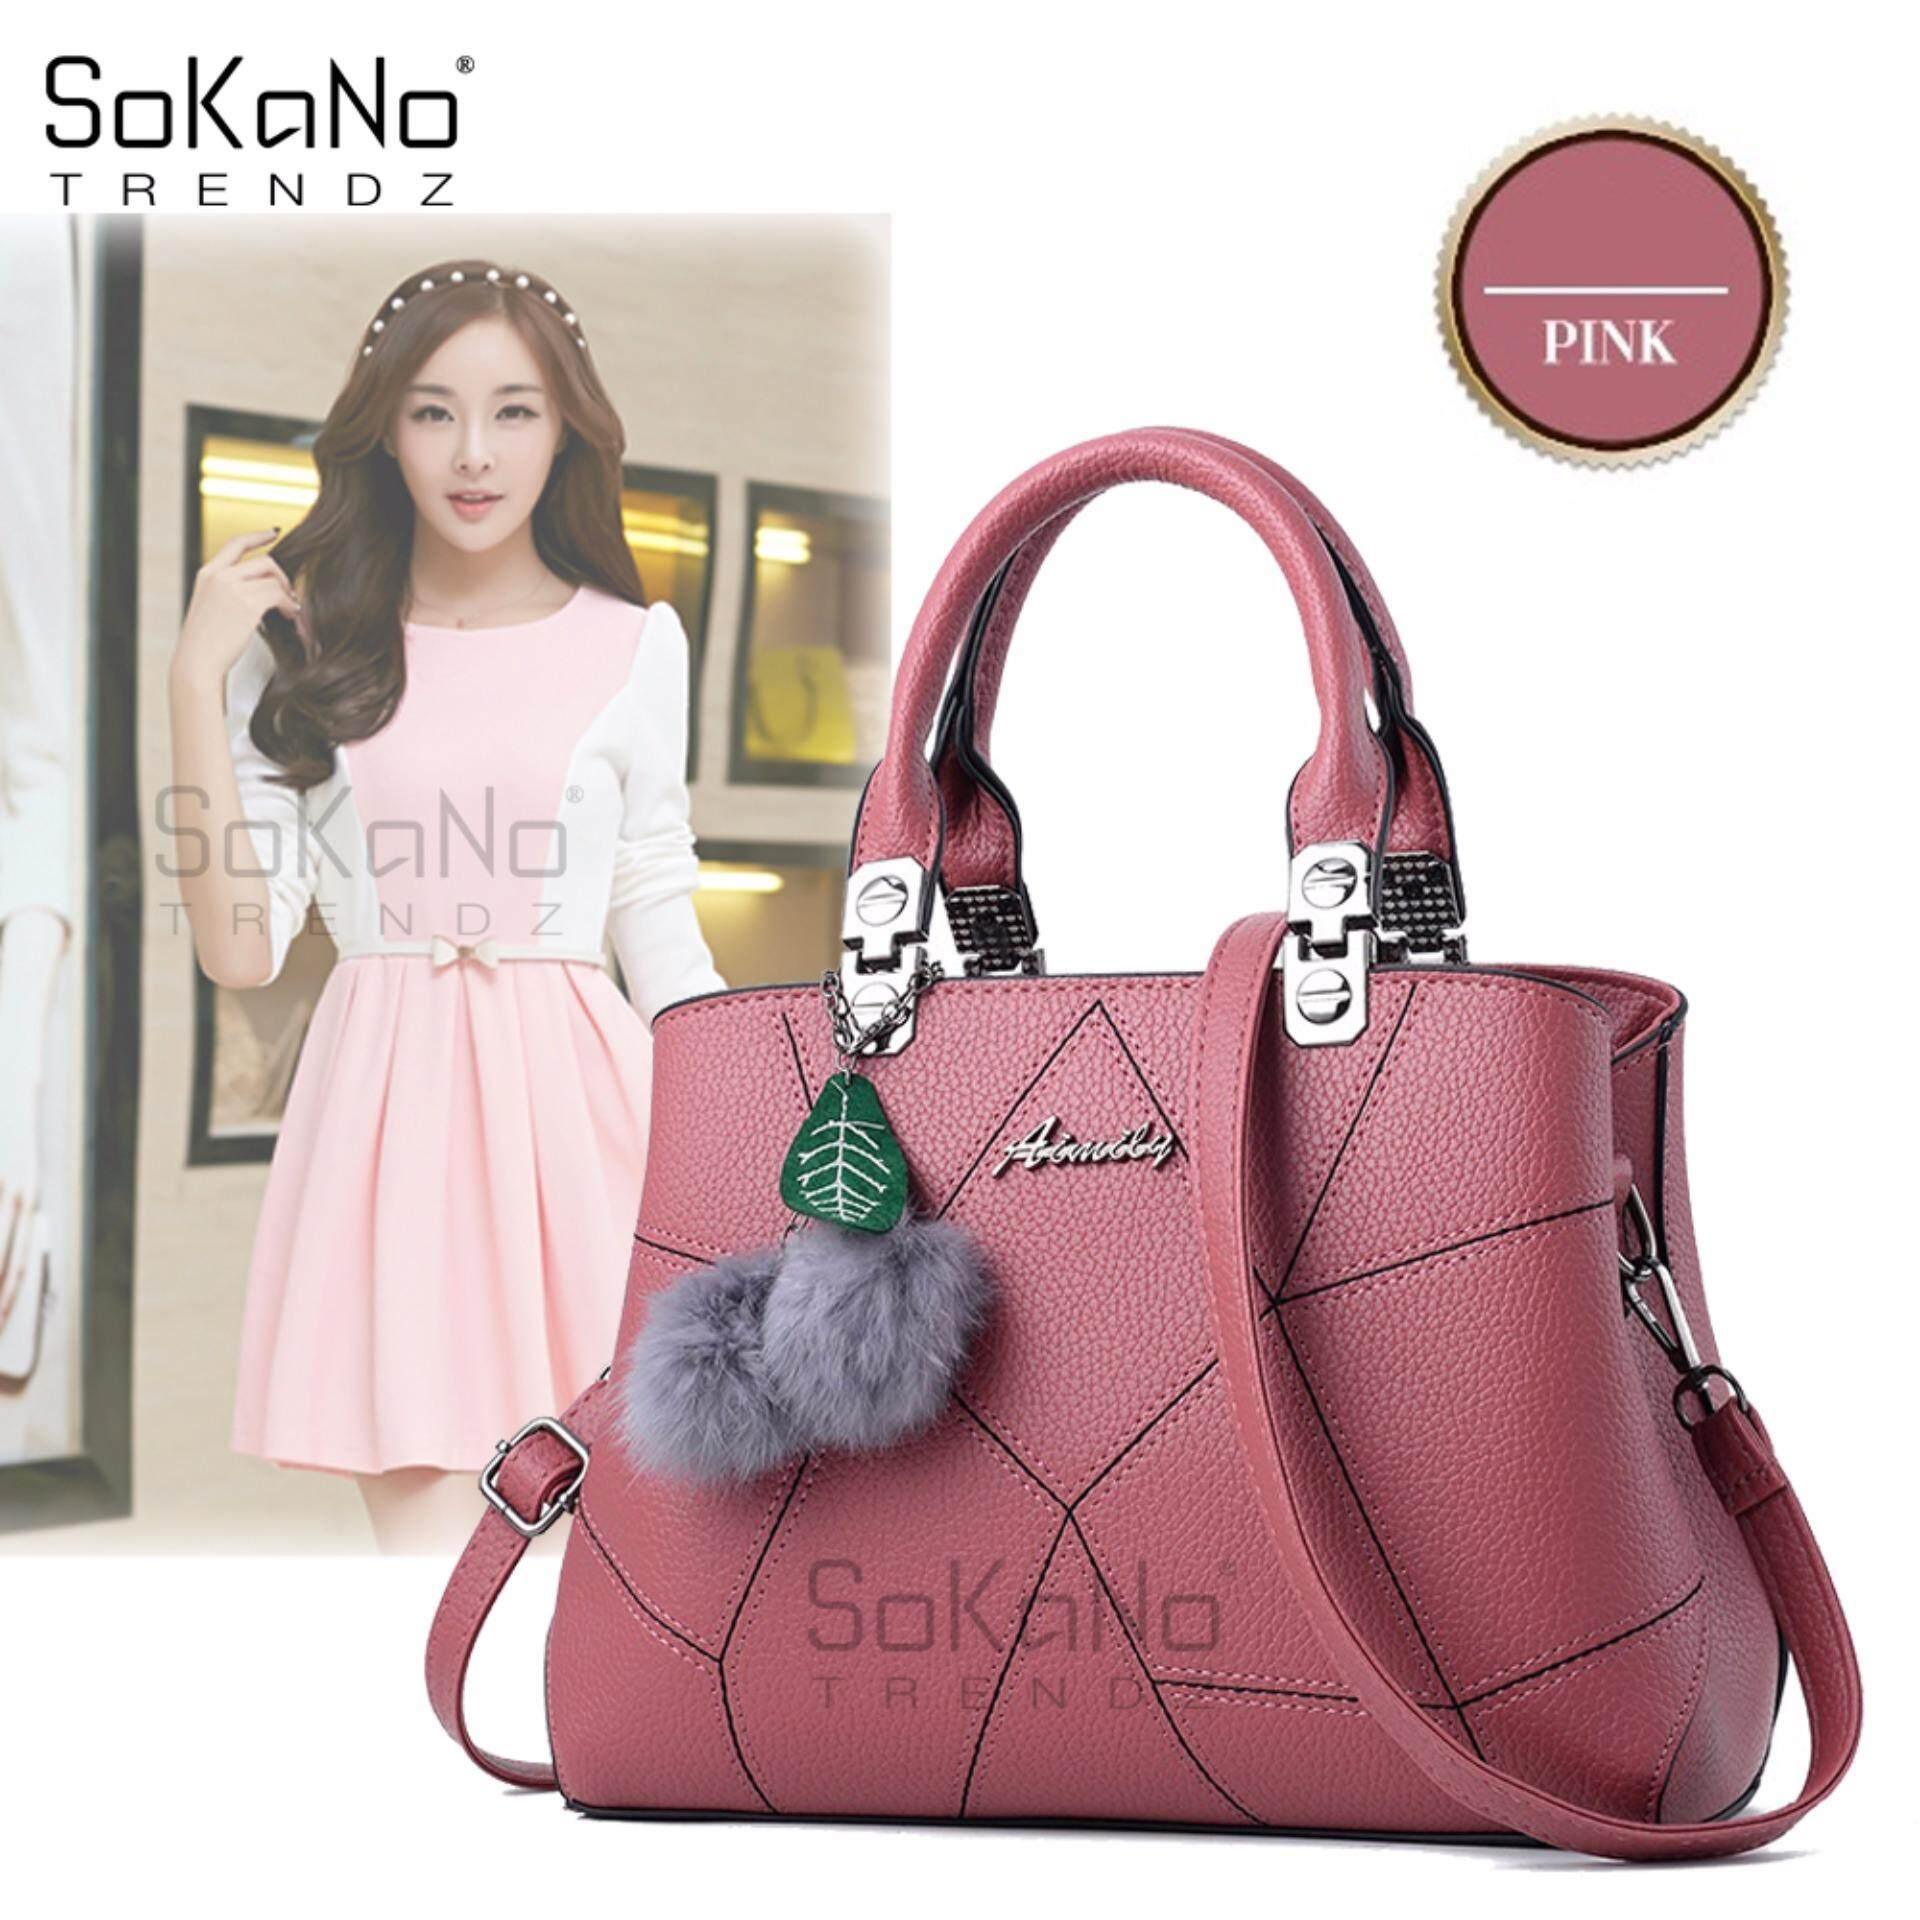 SoKaNo Trendz SKN836 Korean Style Shoulder PU Leather Tote Bag Handbeg Wanita- Pink